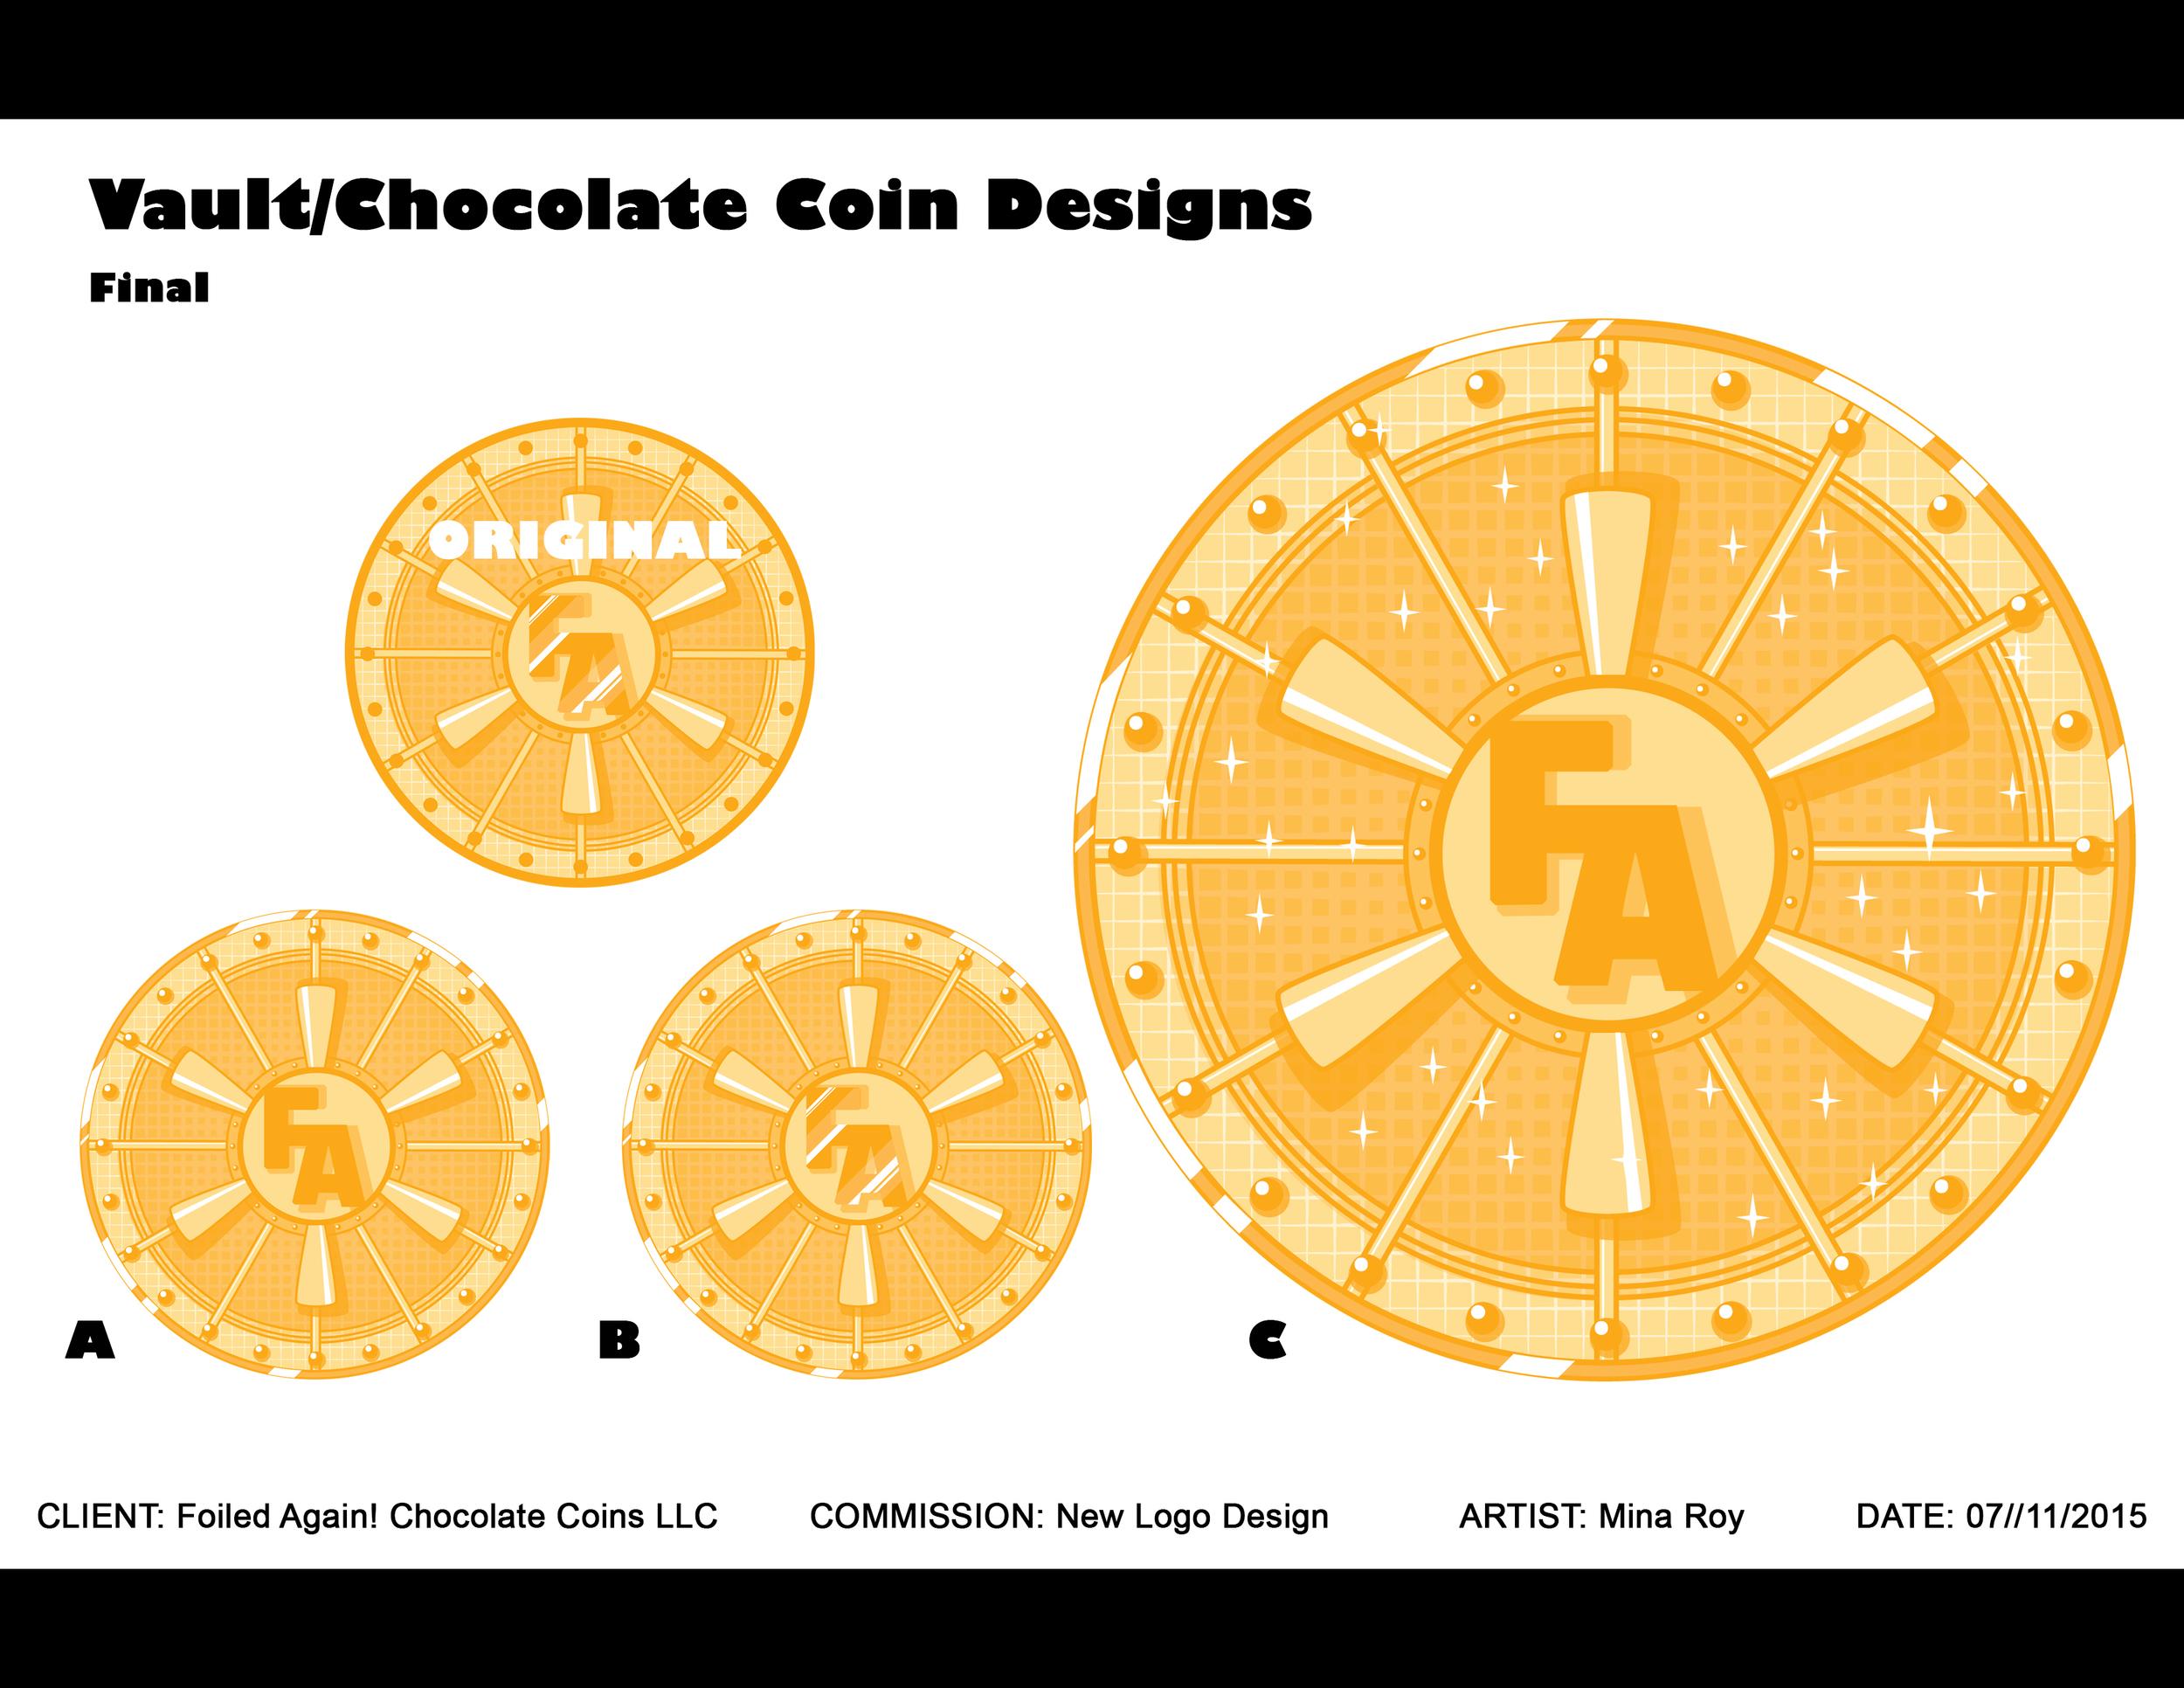 MinaRoy_FoiledAgainChocolate_Commission_S2_Vault_V6a.jpg